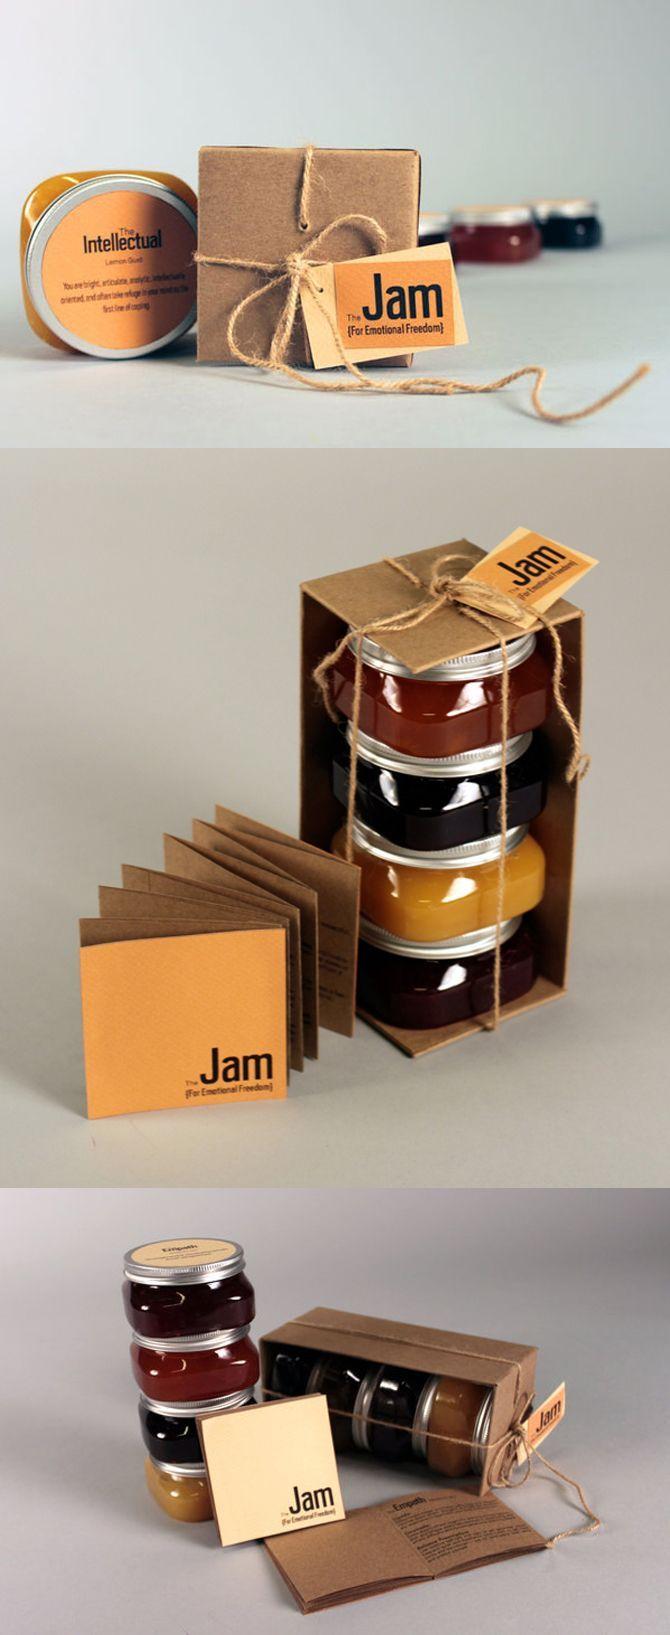 Jam Packaging Designs For Inspiration - We Design Packaging ...